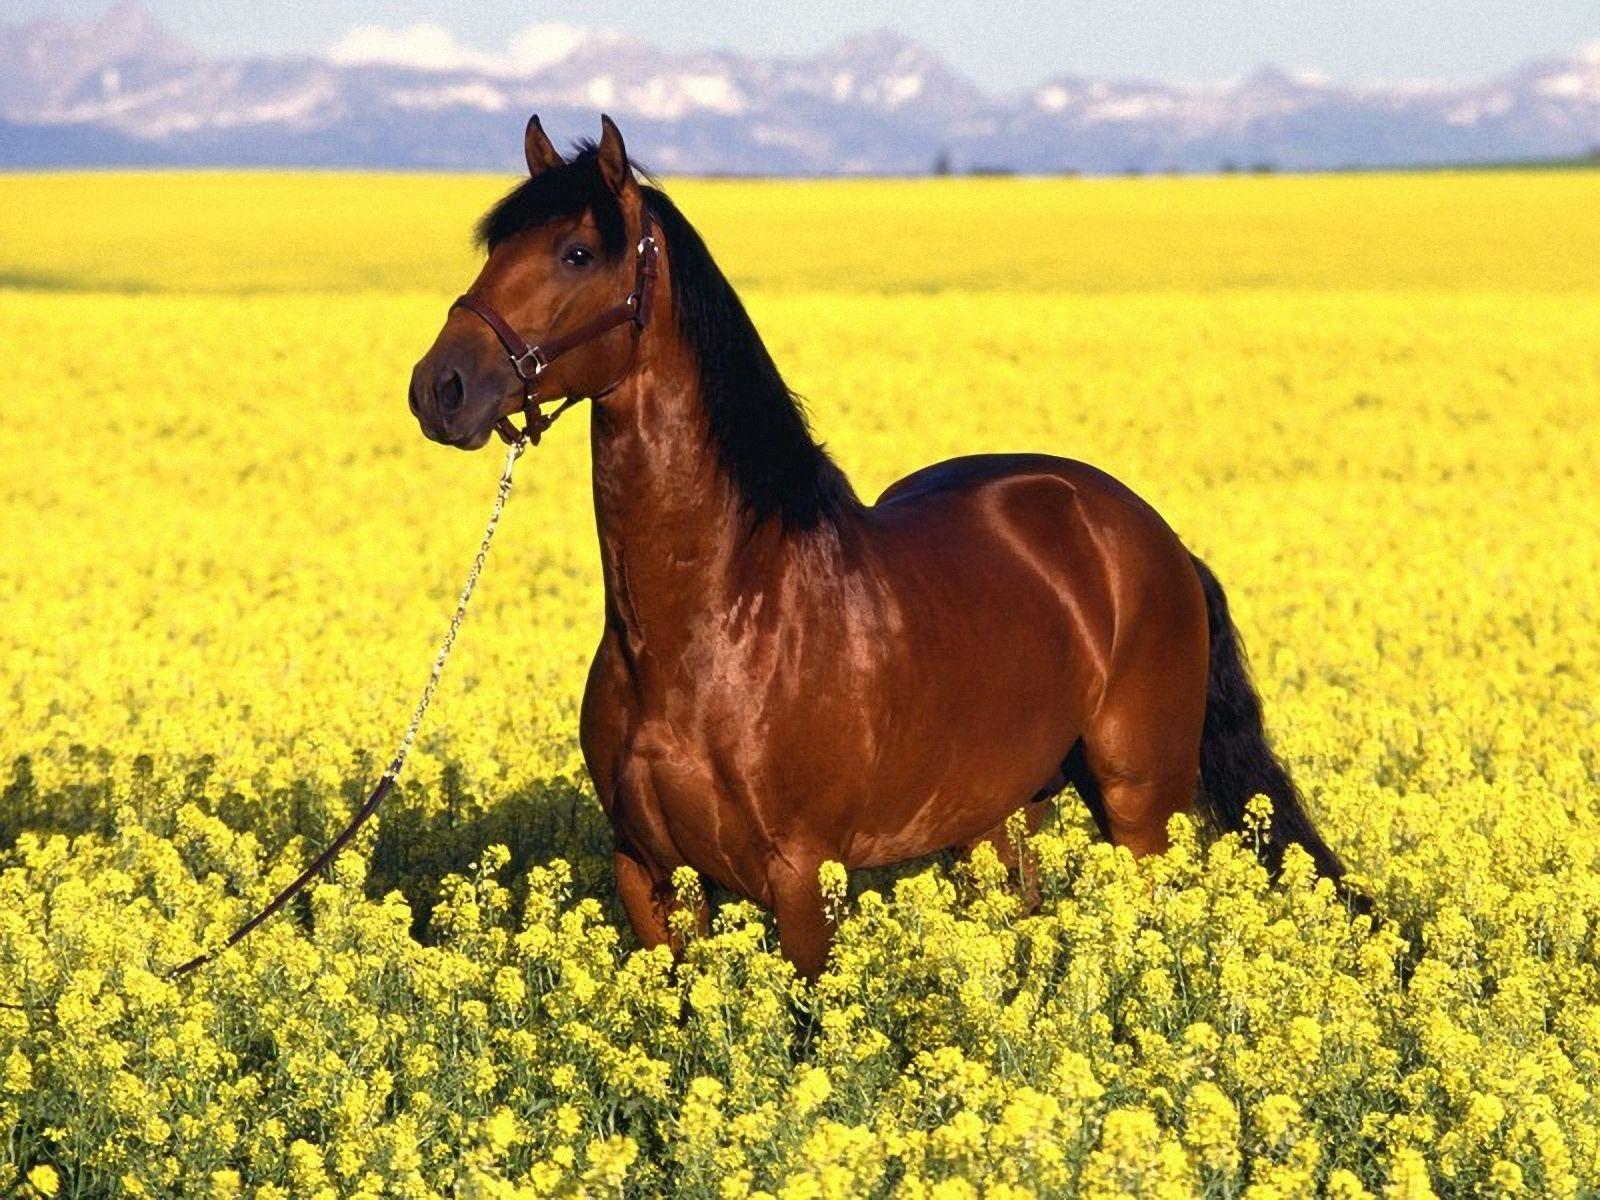 Beautiful Wallpaper Horse Yellow - c8e3709b63d06bc45b0c4684044aad8d  Graphic_644964.jpg